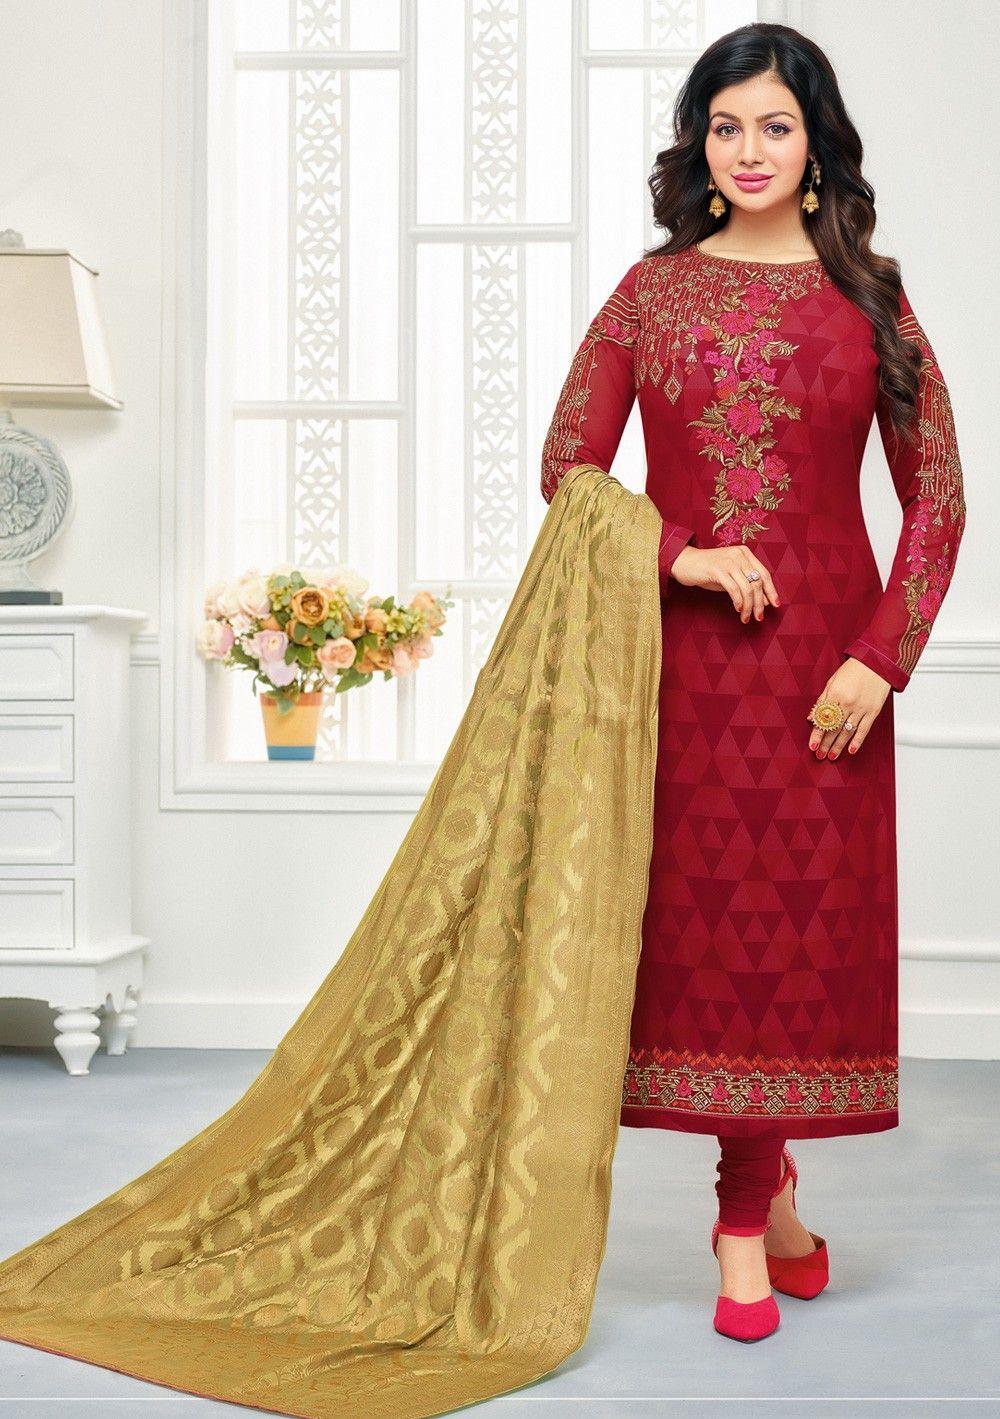 c0b475605d HD Images Of Ayesha Takia In Beautiful Latest Salwar Kameez Designs 2018  Straight Cut